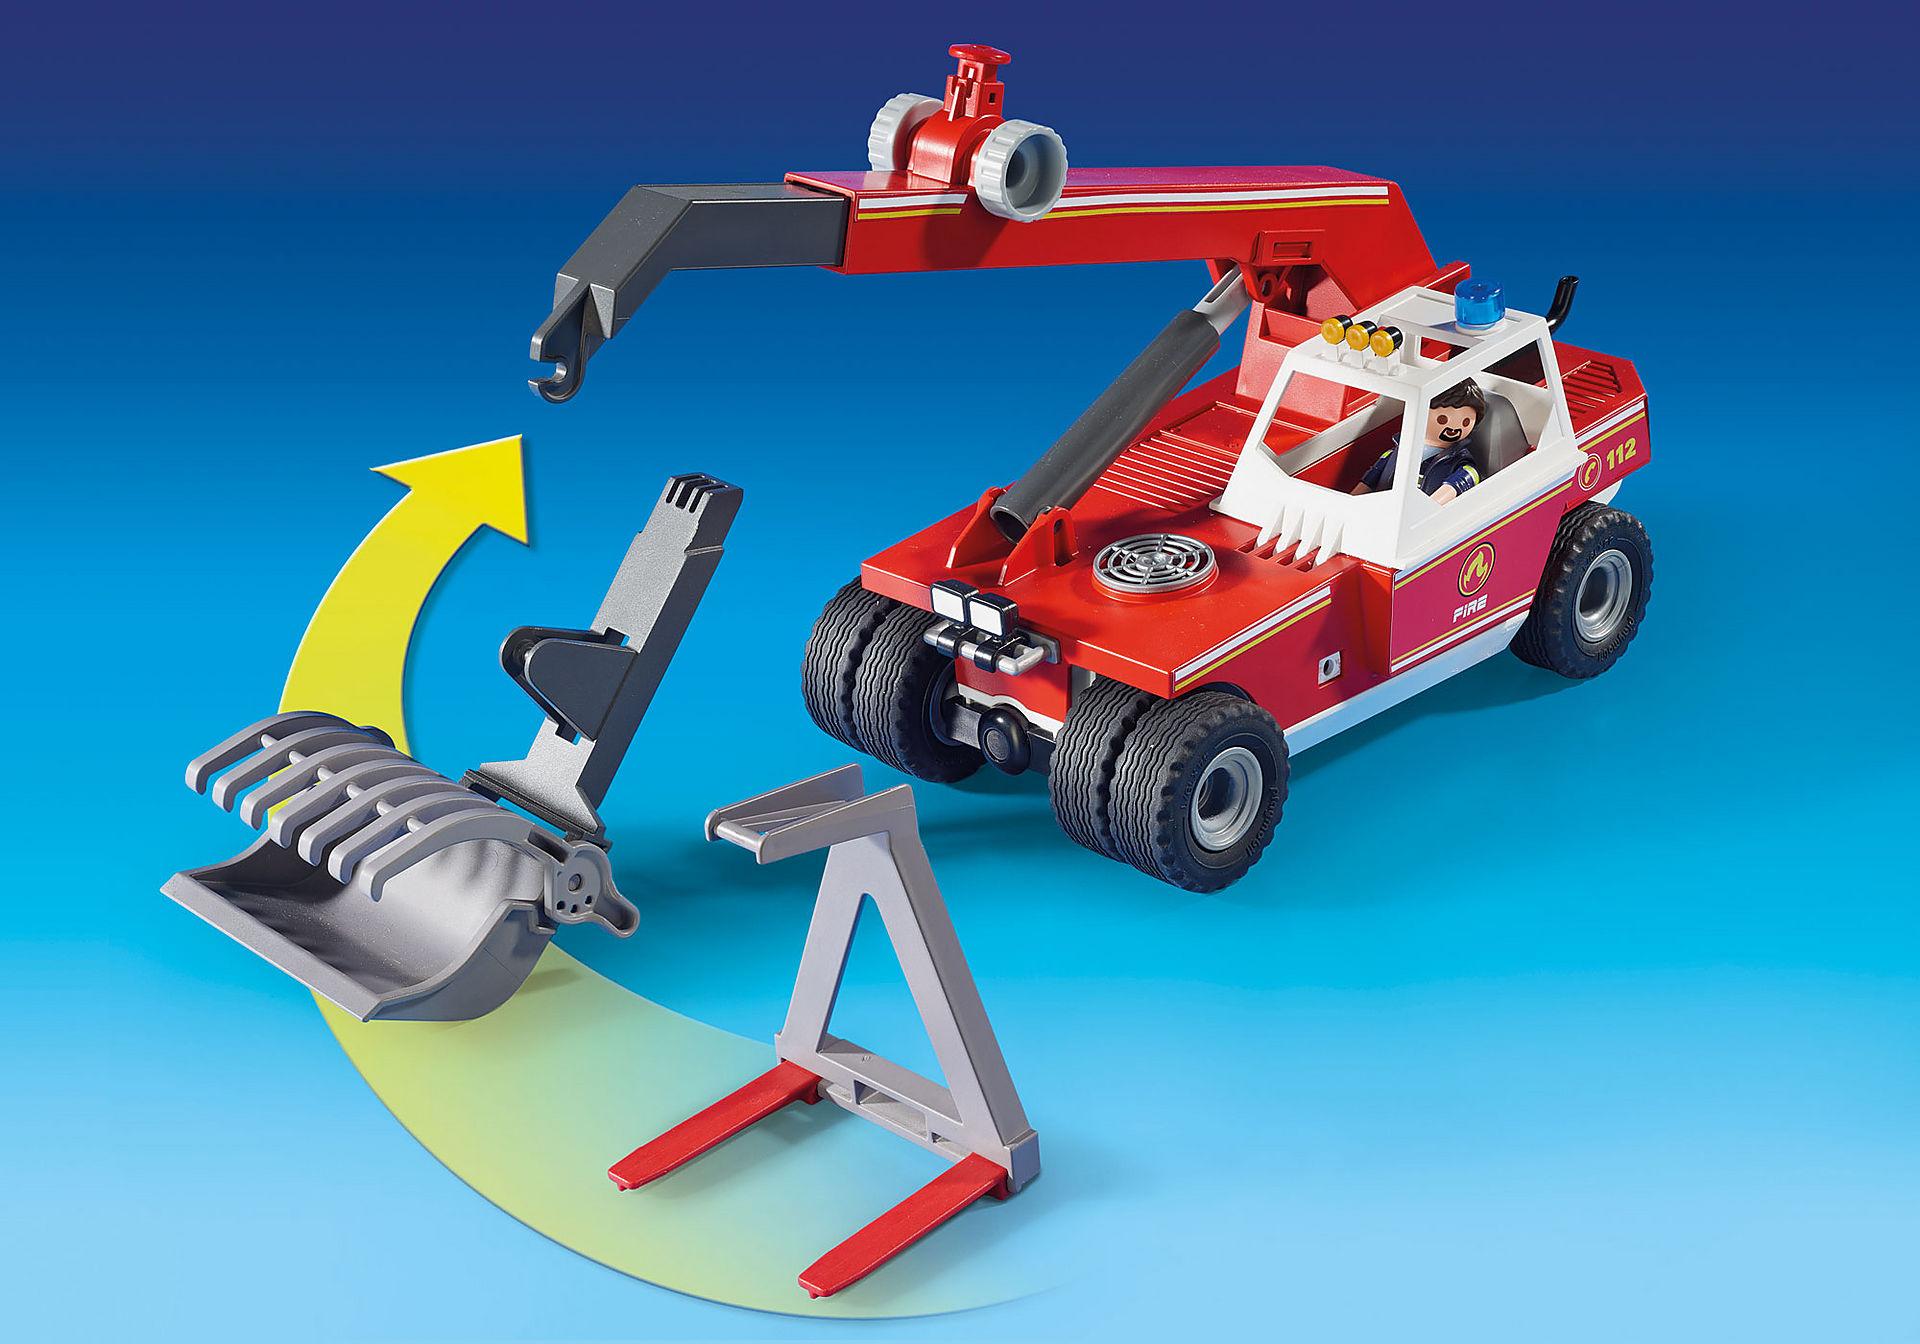 http://media.playmobil.com/i/playmobil/9465_product_extra1/Feuerwehr-Teleskoplader